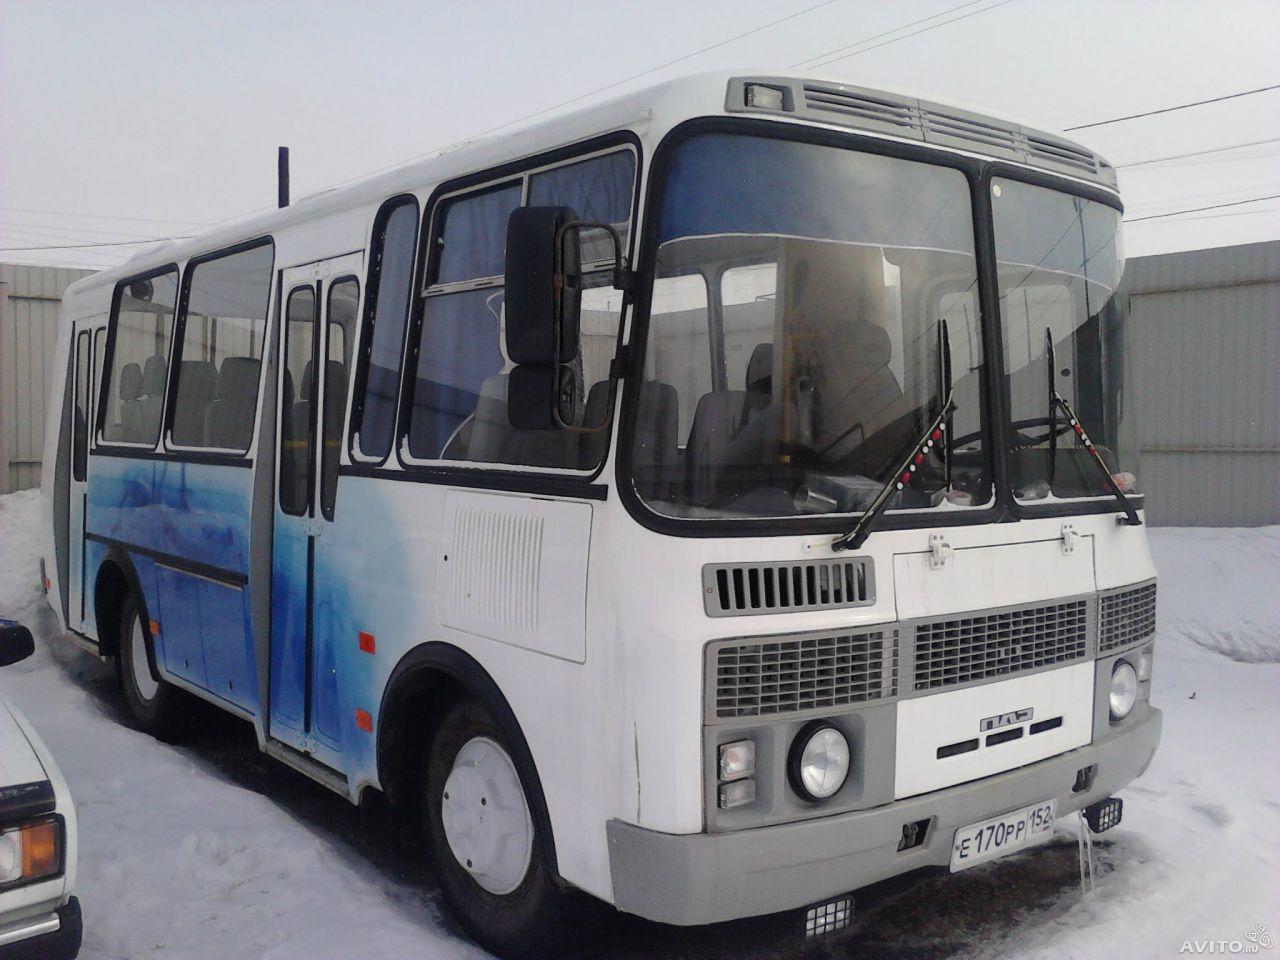 Тюнинг автобуса паз своими руками фото